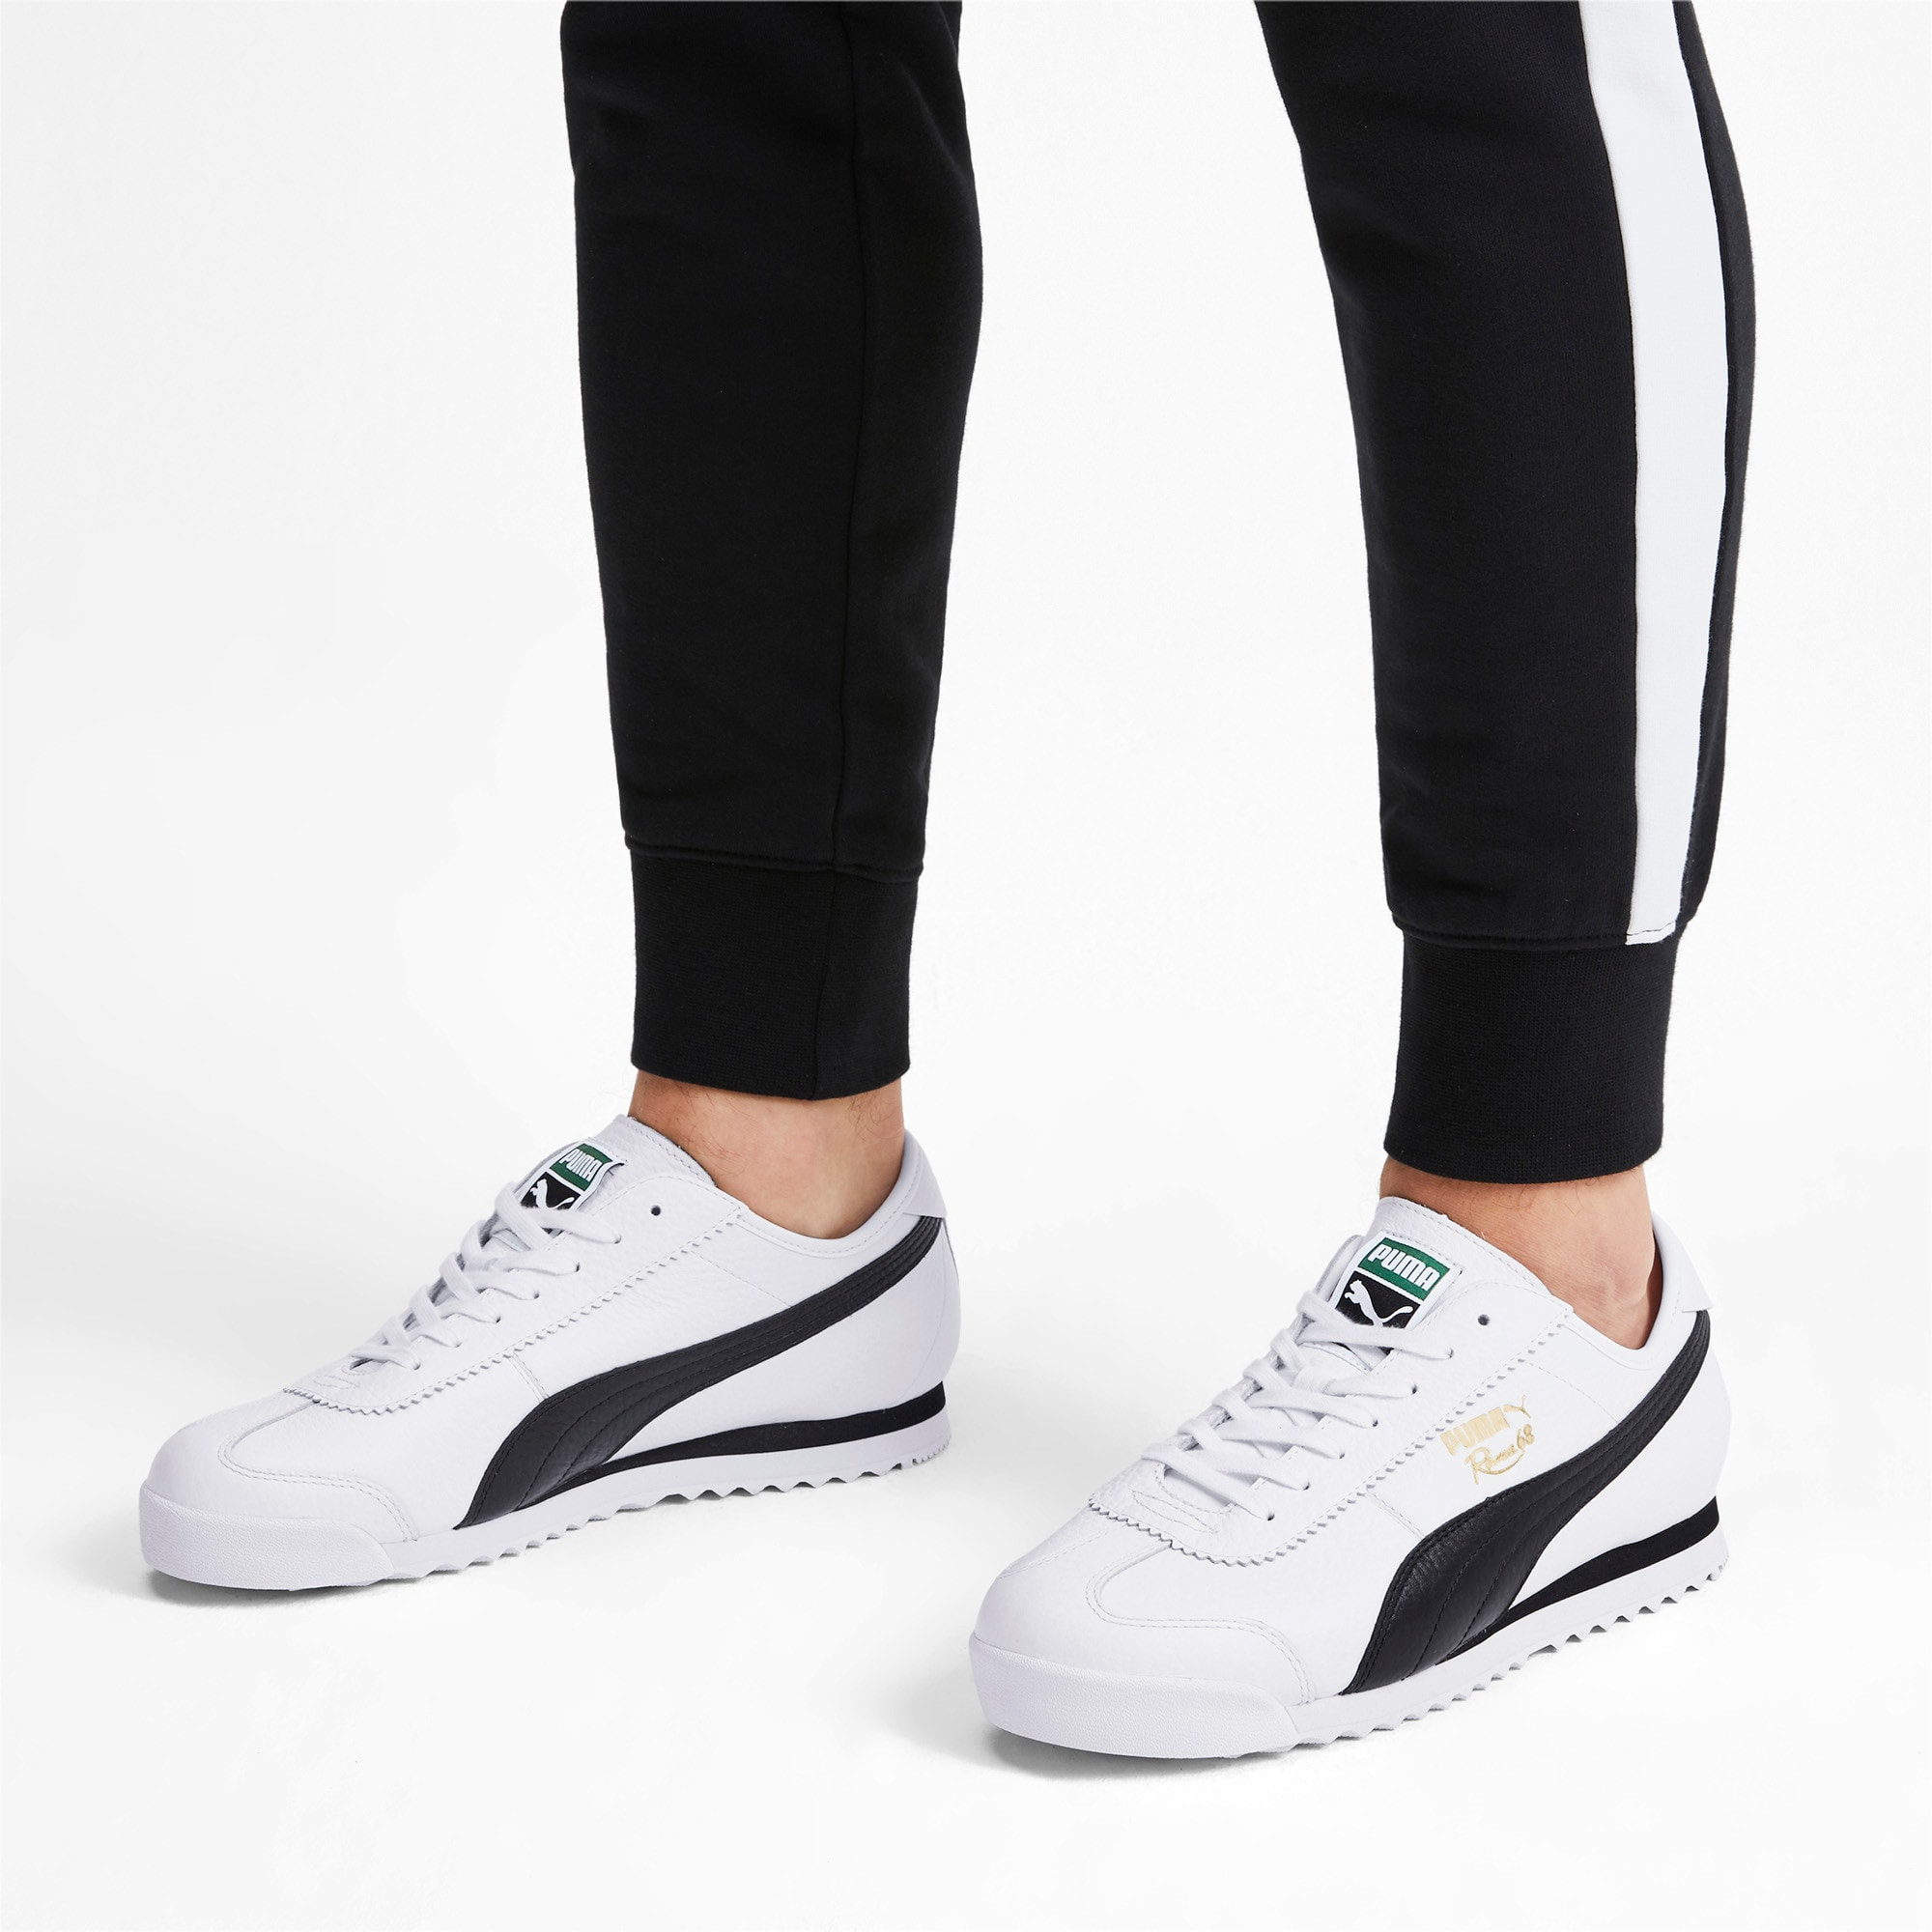 Thumbnail 2 of Roma '68 Vintage Sneakers, Puma White-Puma Black, medium